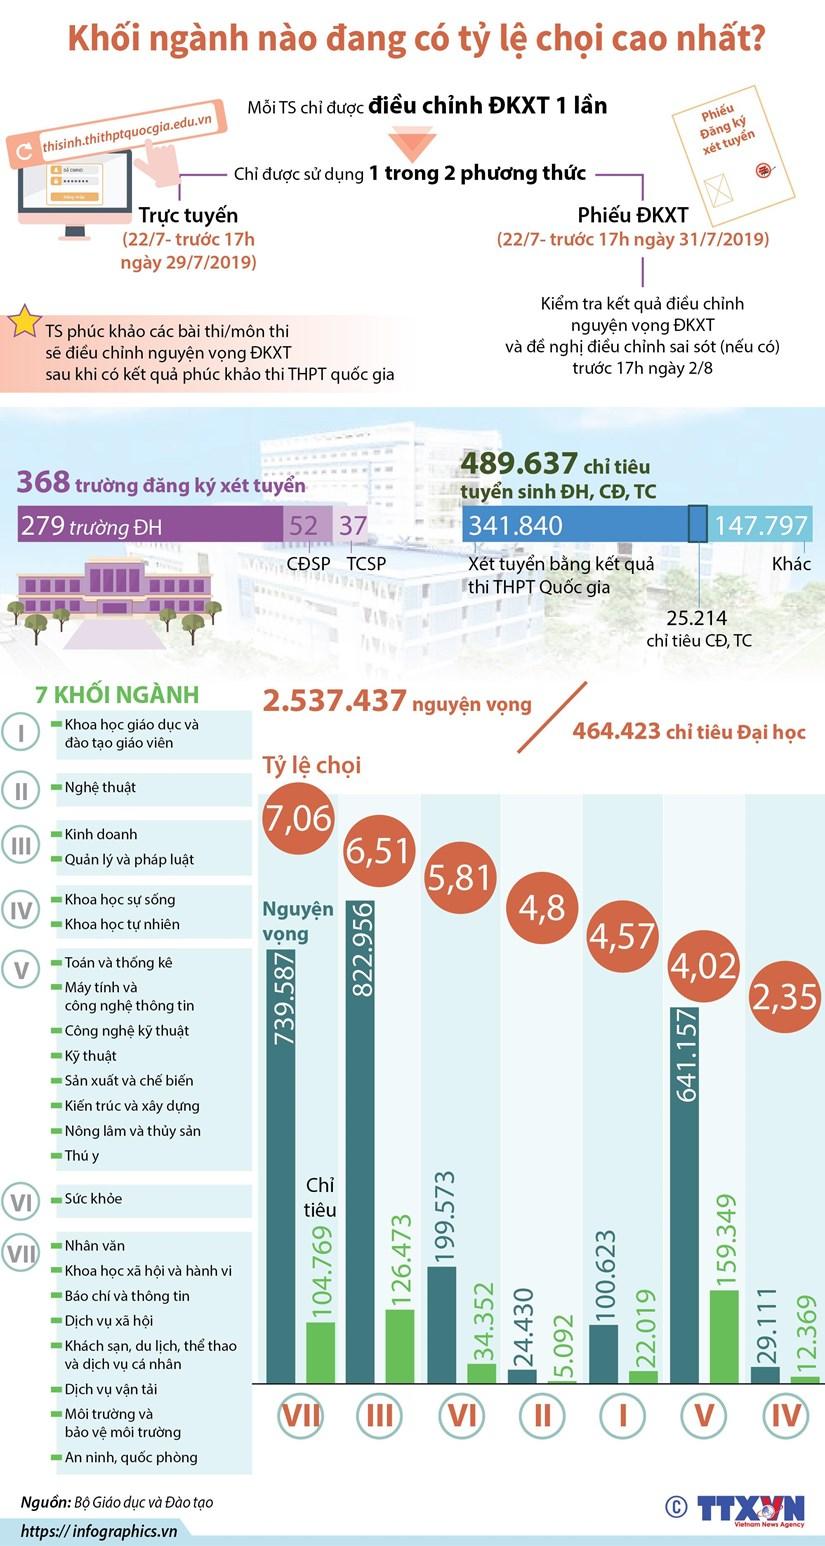 [Infographics] Khoi nganh nao dang co ty le choi cao nhat? hinh anh 1